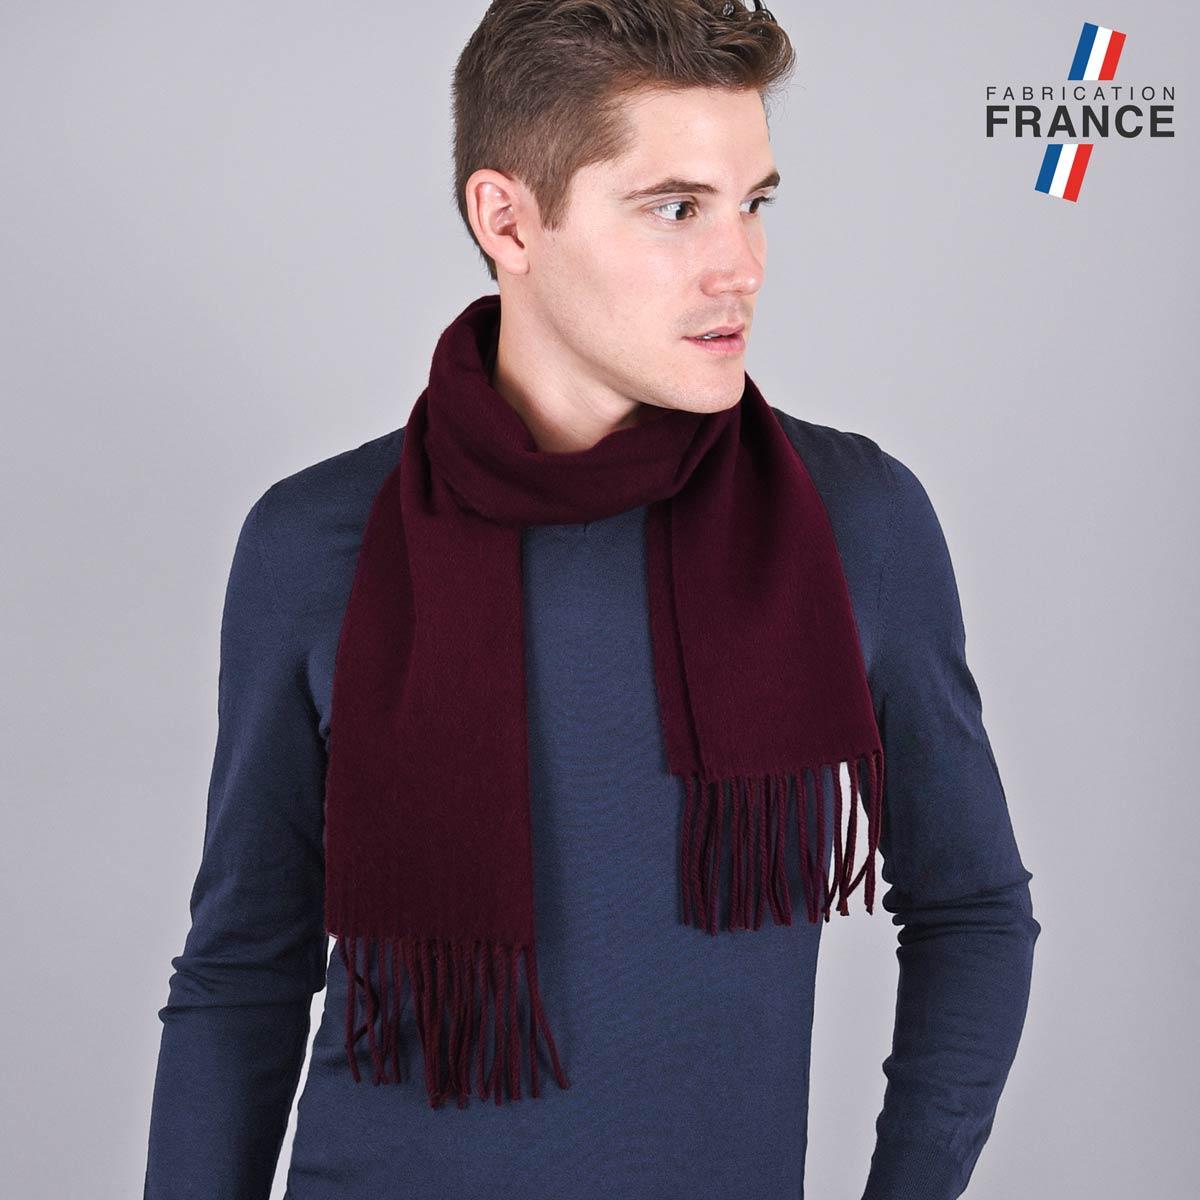 AT-05117_M12-1FR_Echarpe-homme-bordeaux-franges-fabrication-france